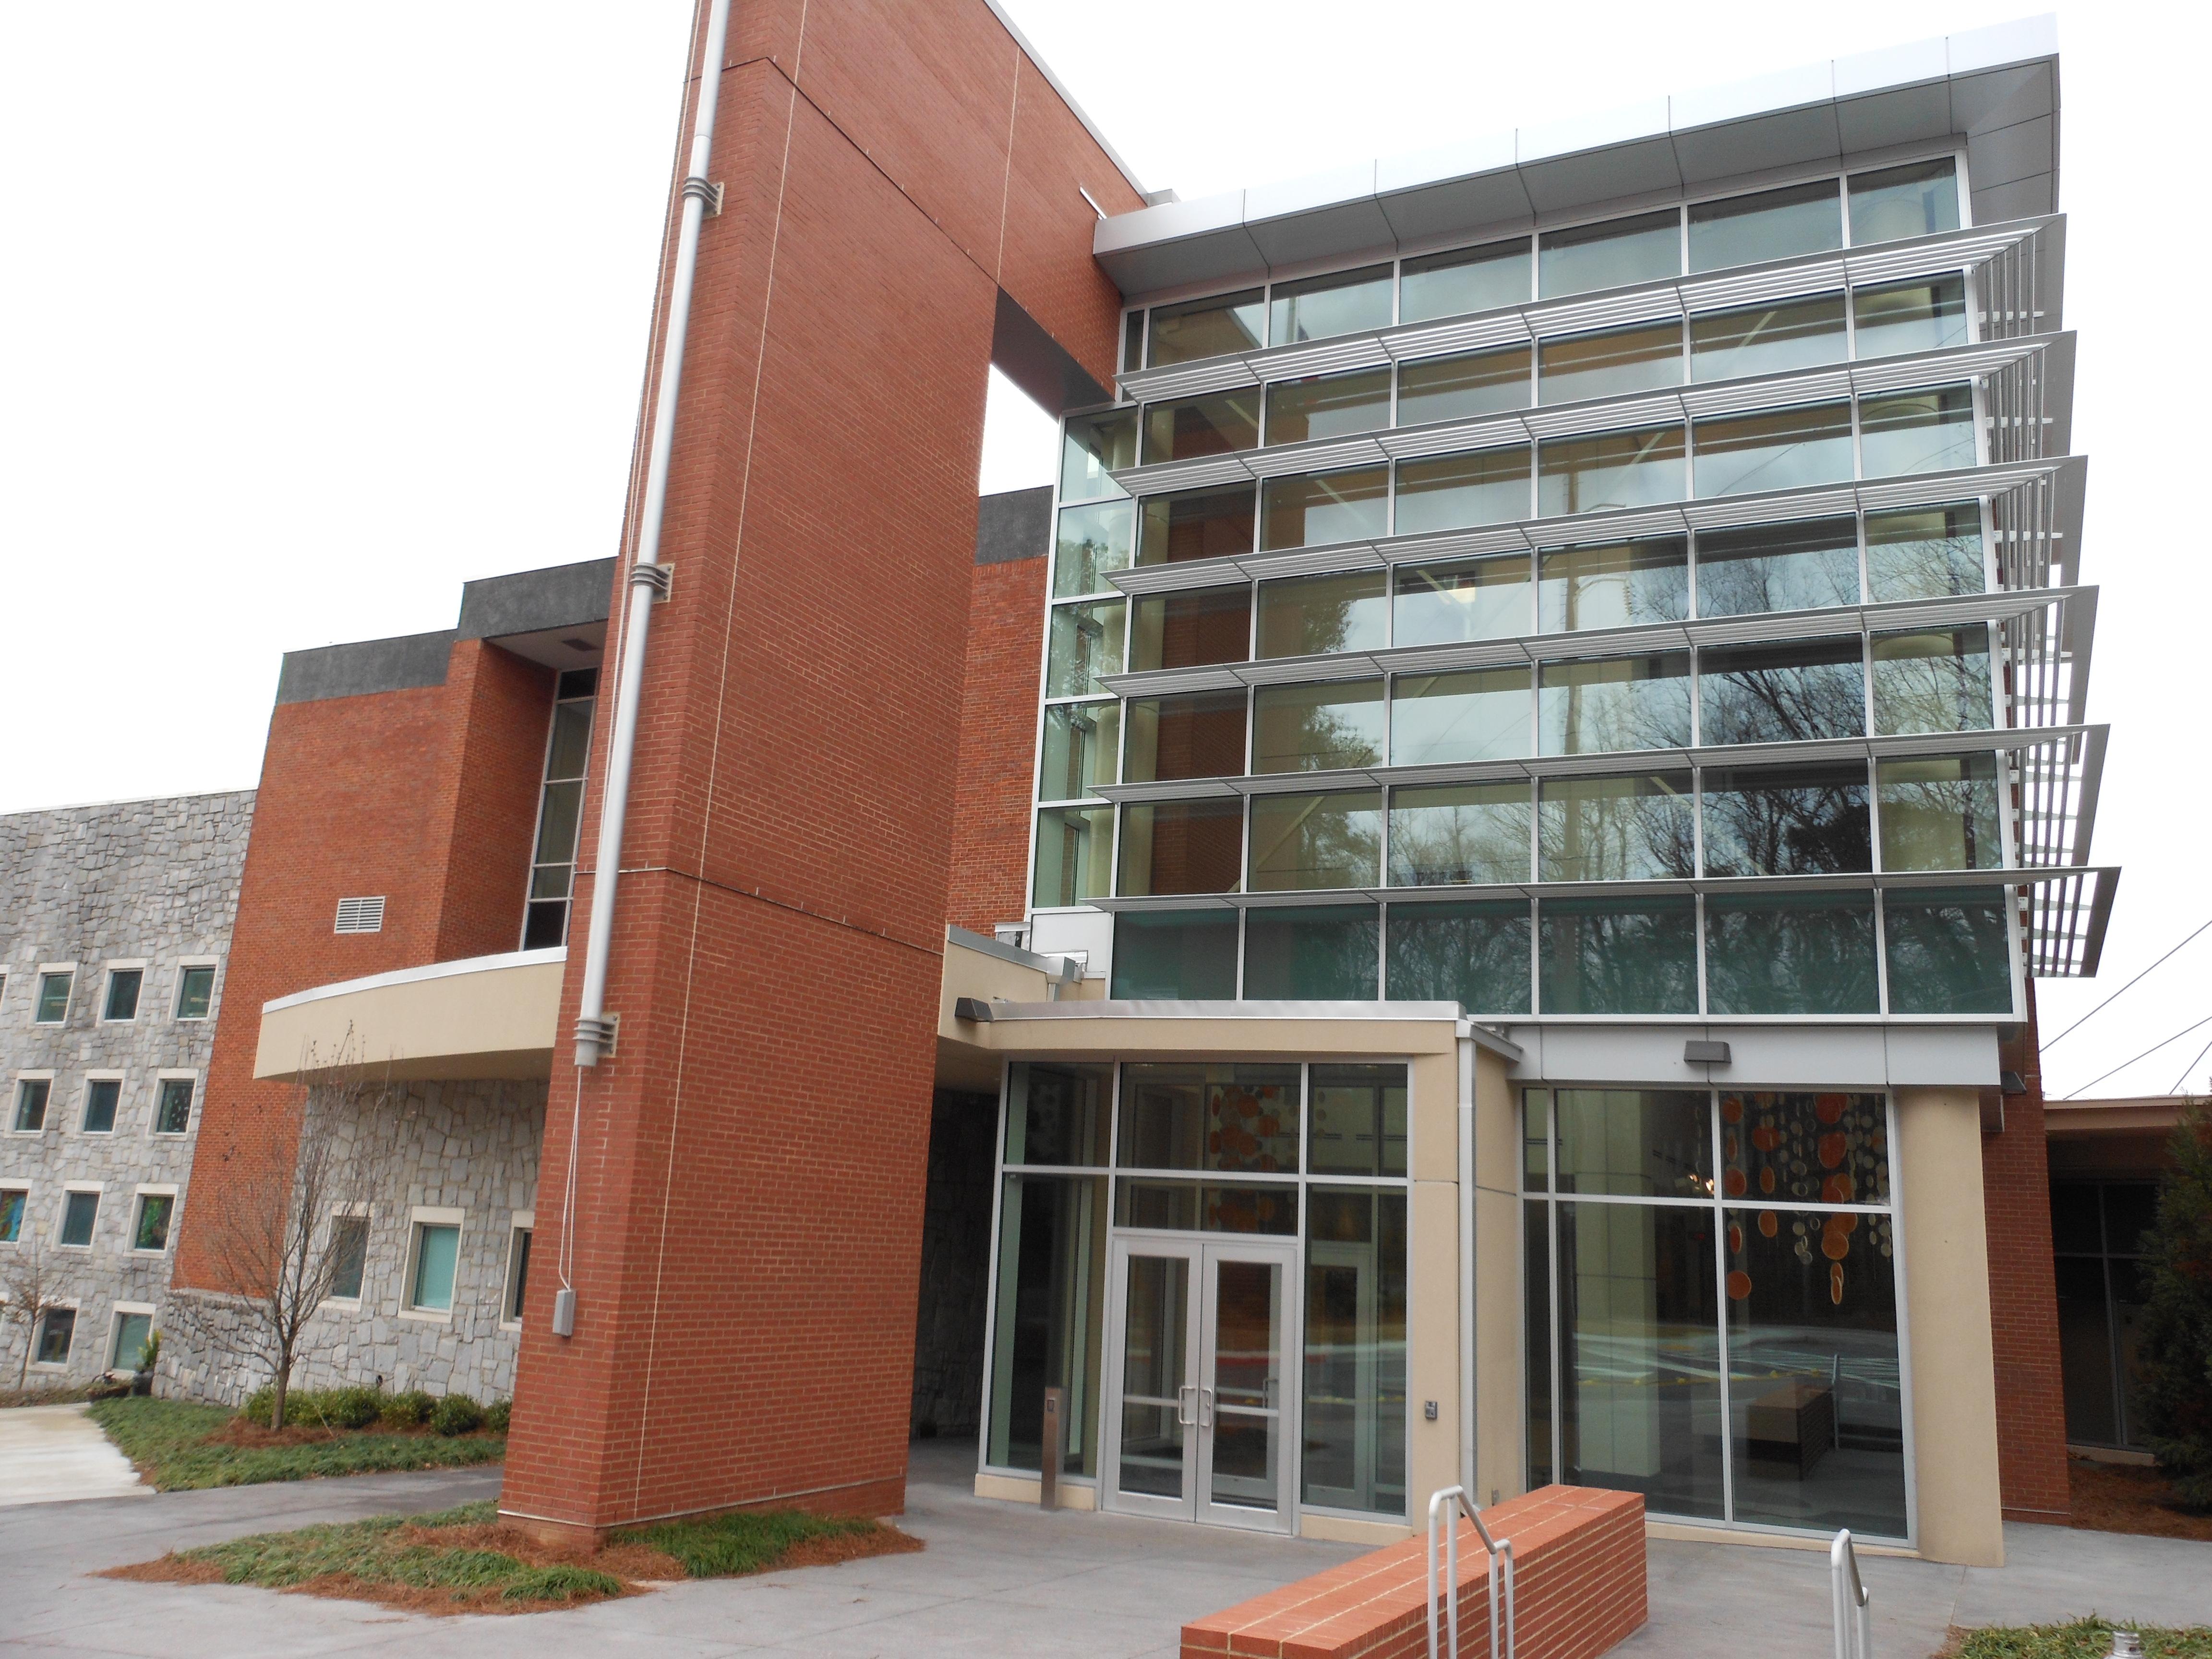 Orlando Kia North >> North Atlanta High School | SAF - Southern Aluminum Finishing Co, Inc. SAF – Southern Aluminum ...